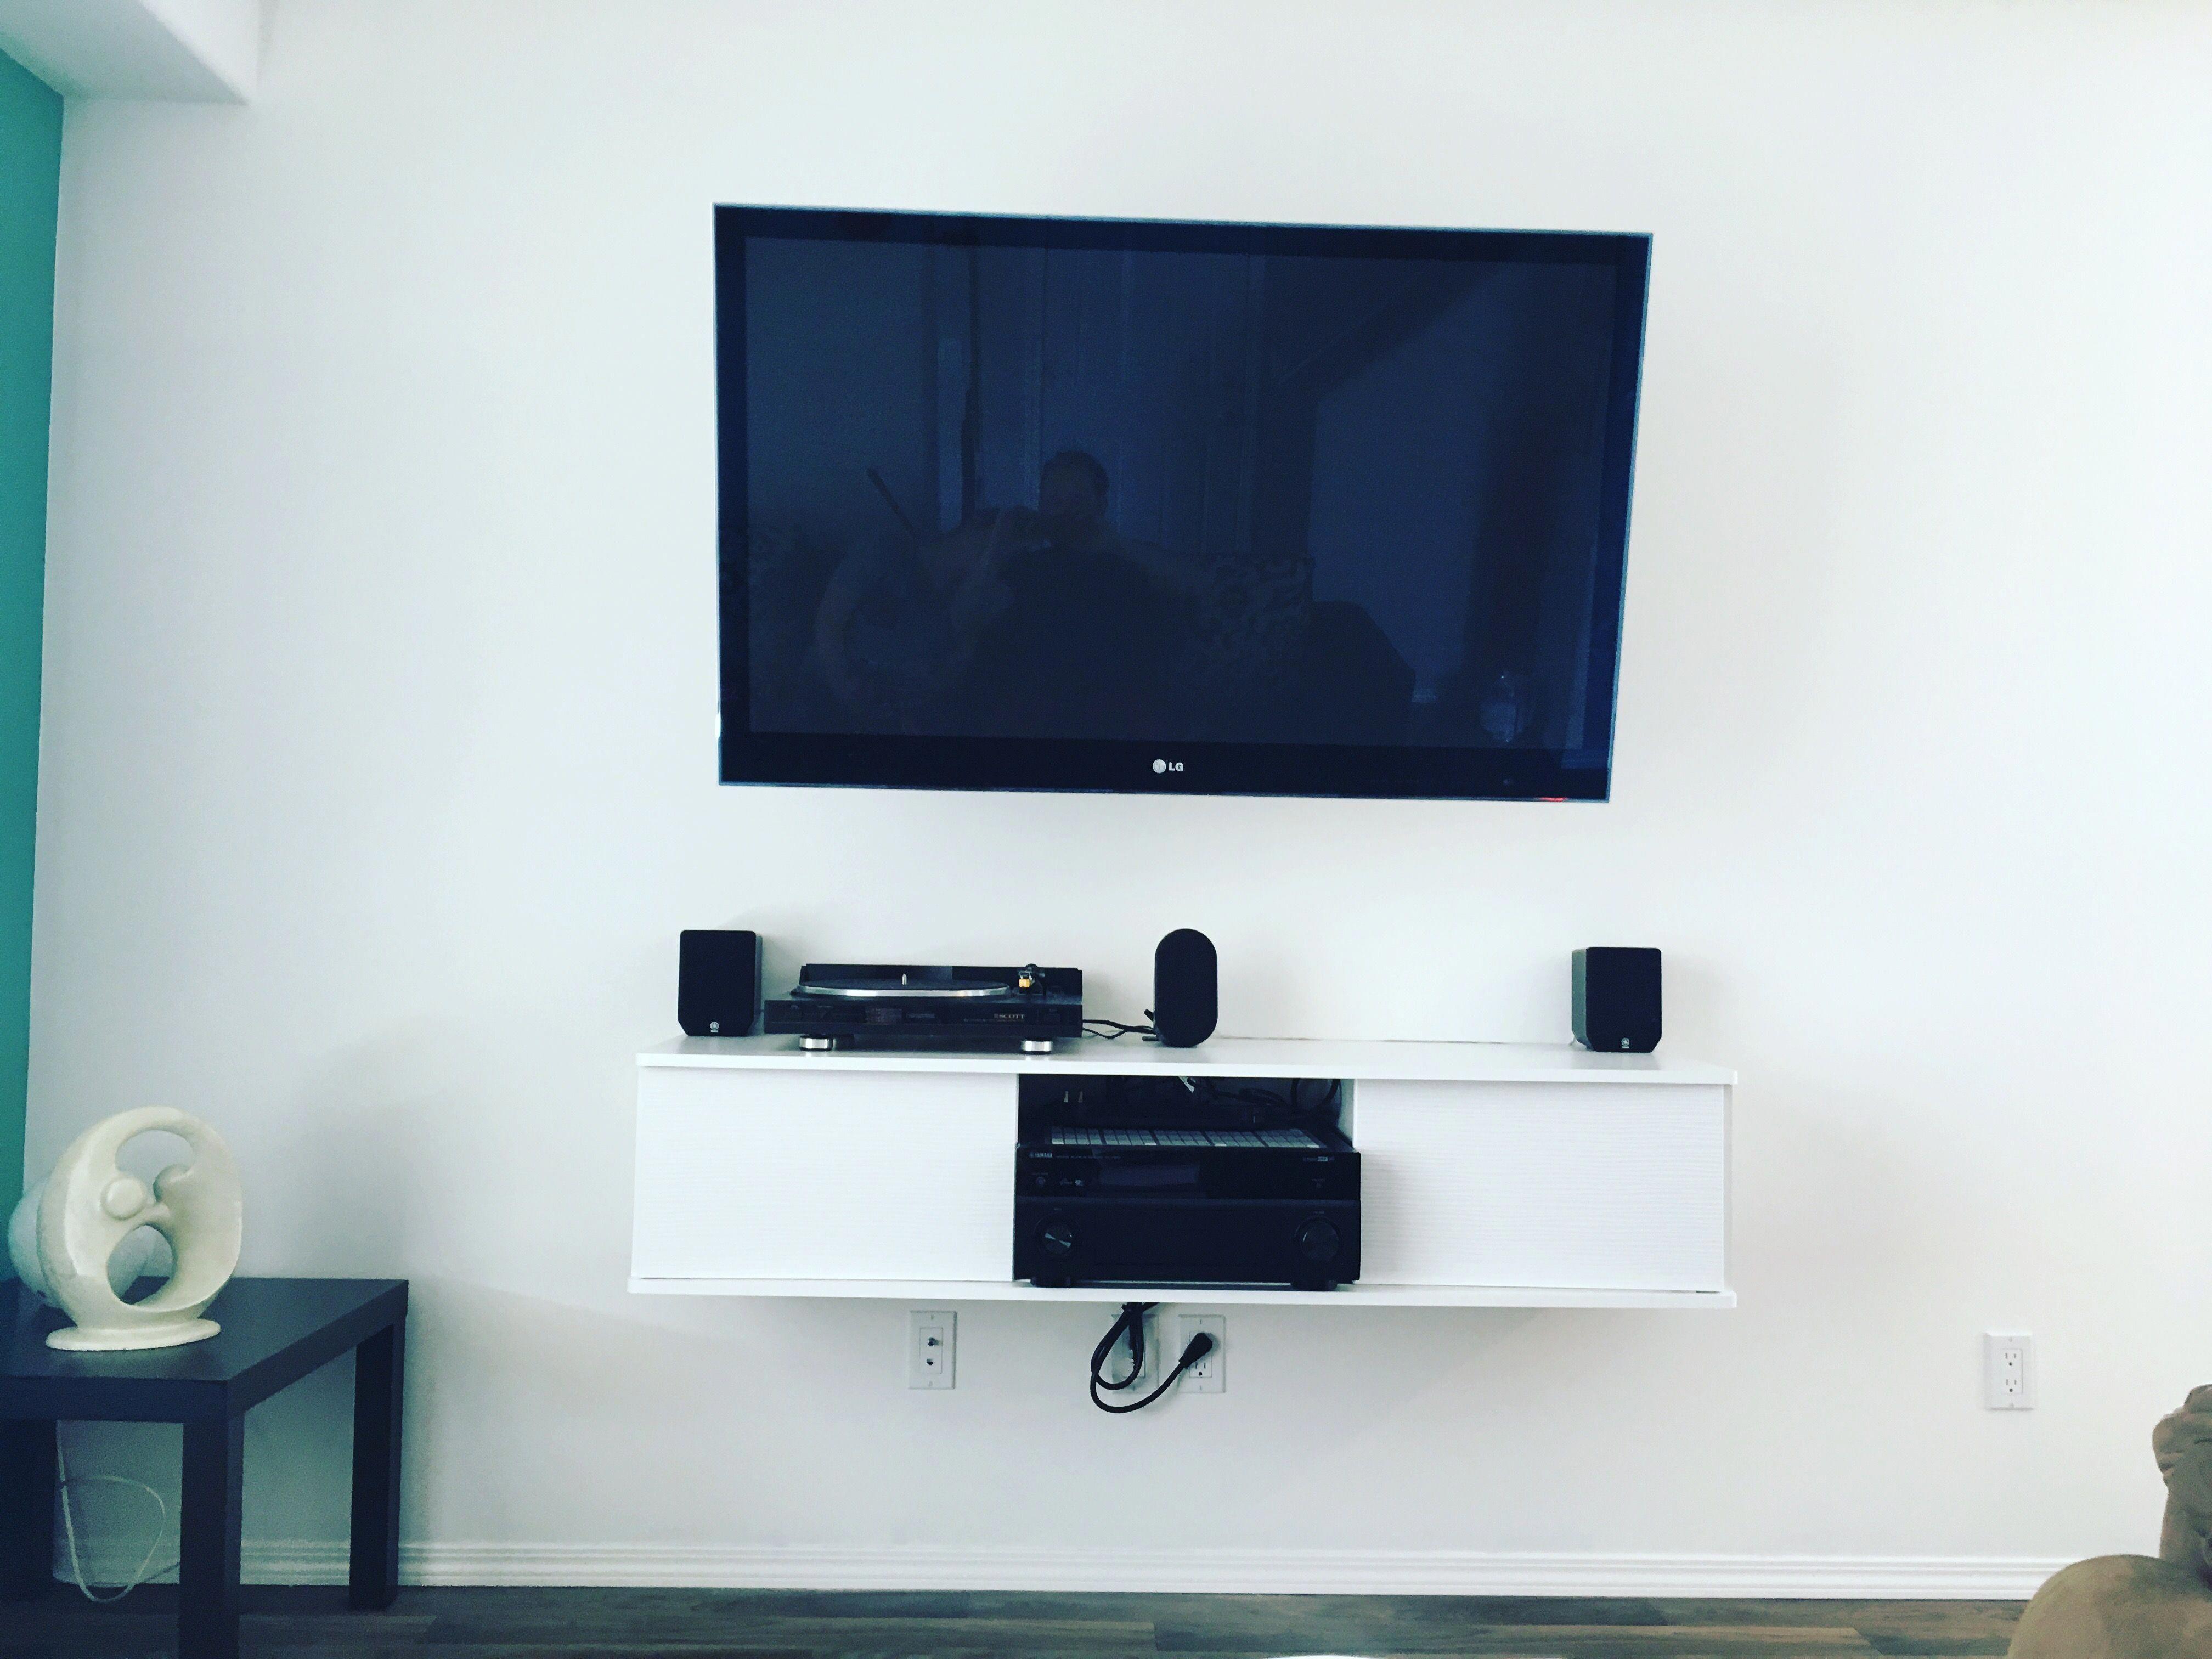 Tv Wall Mount Minimalistic Wallmountedtable Flat Screen Mounted